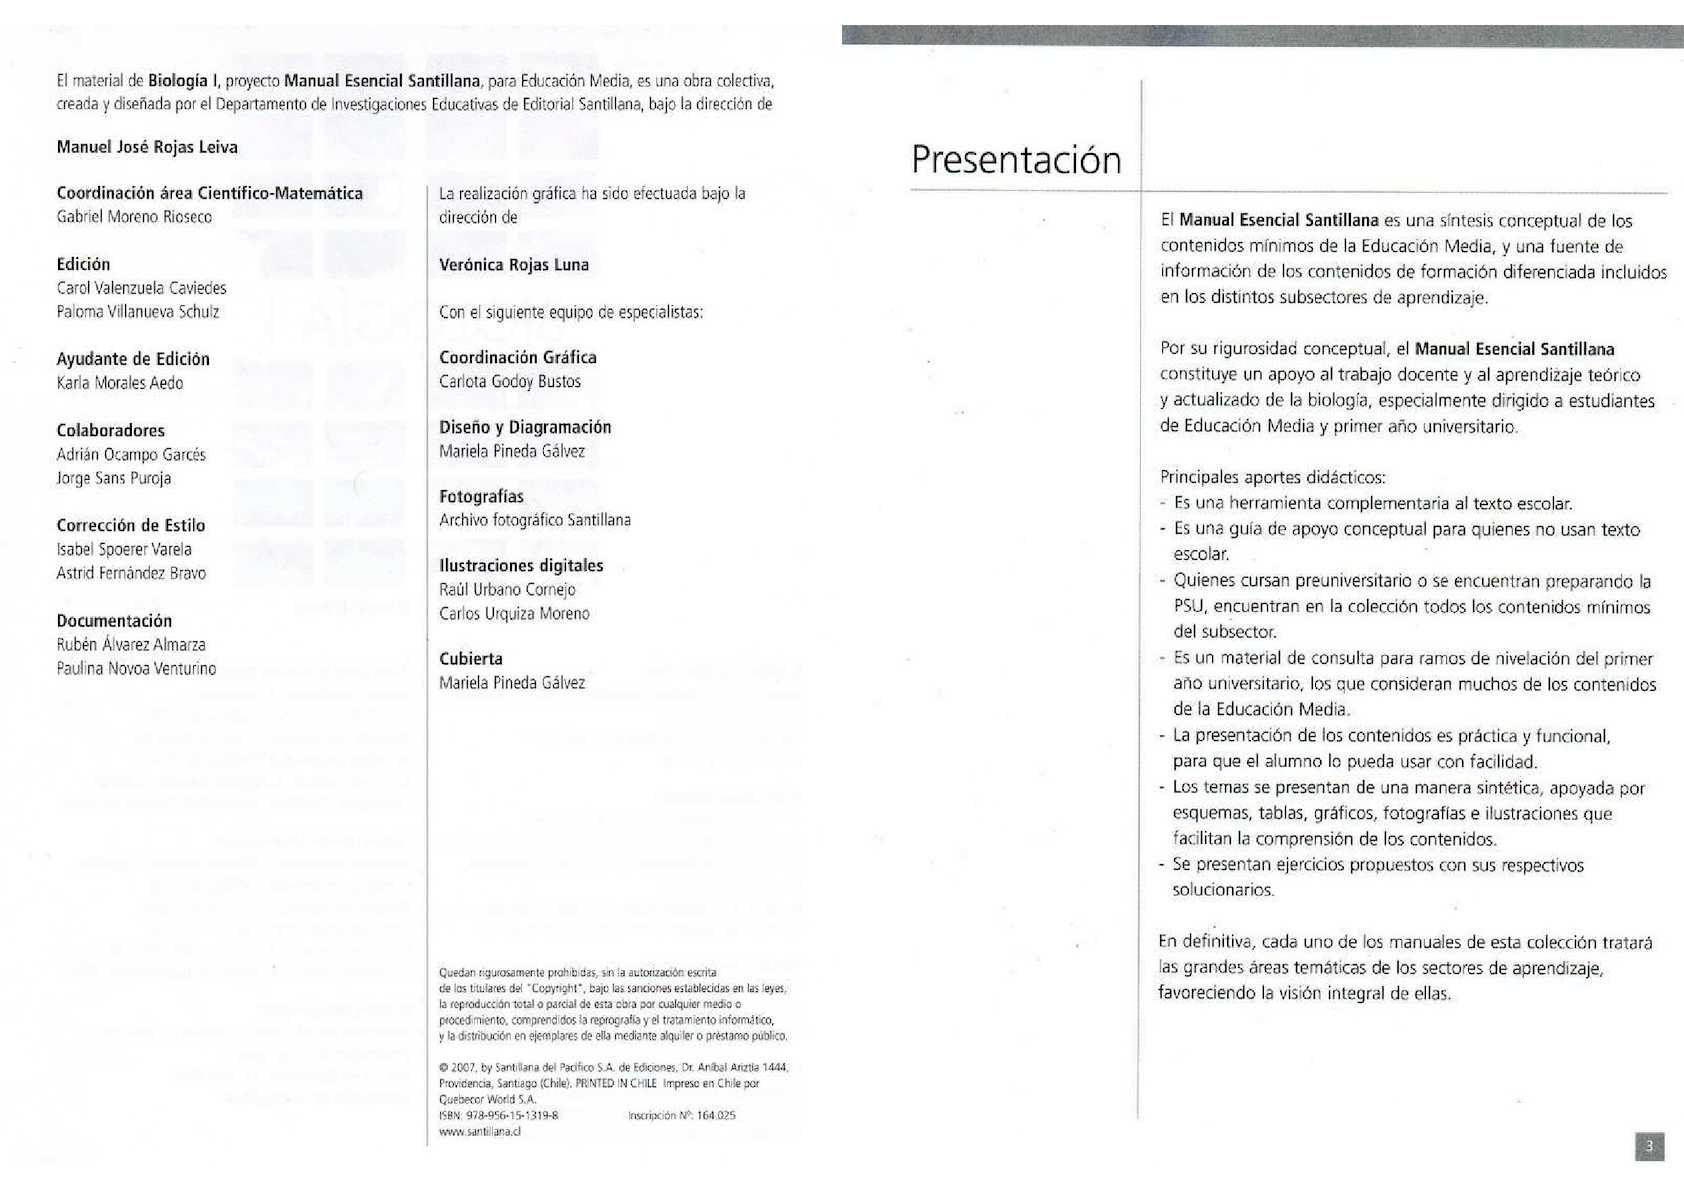 Biología I; Editorial Santillana   CALAMEO Downloader